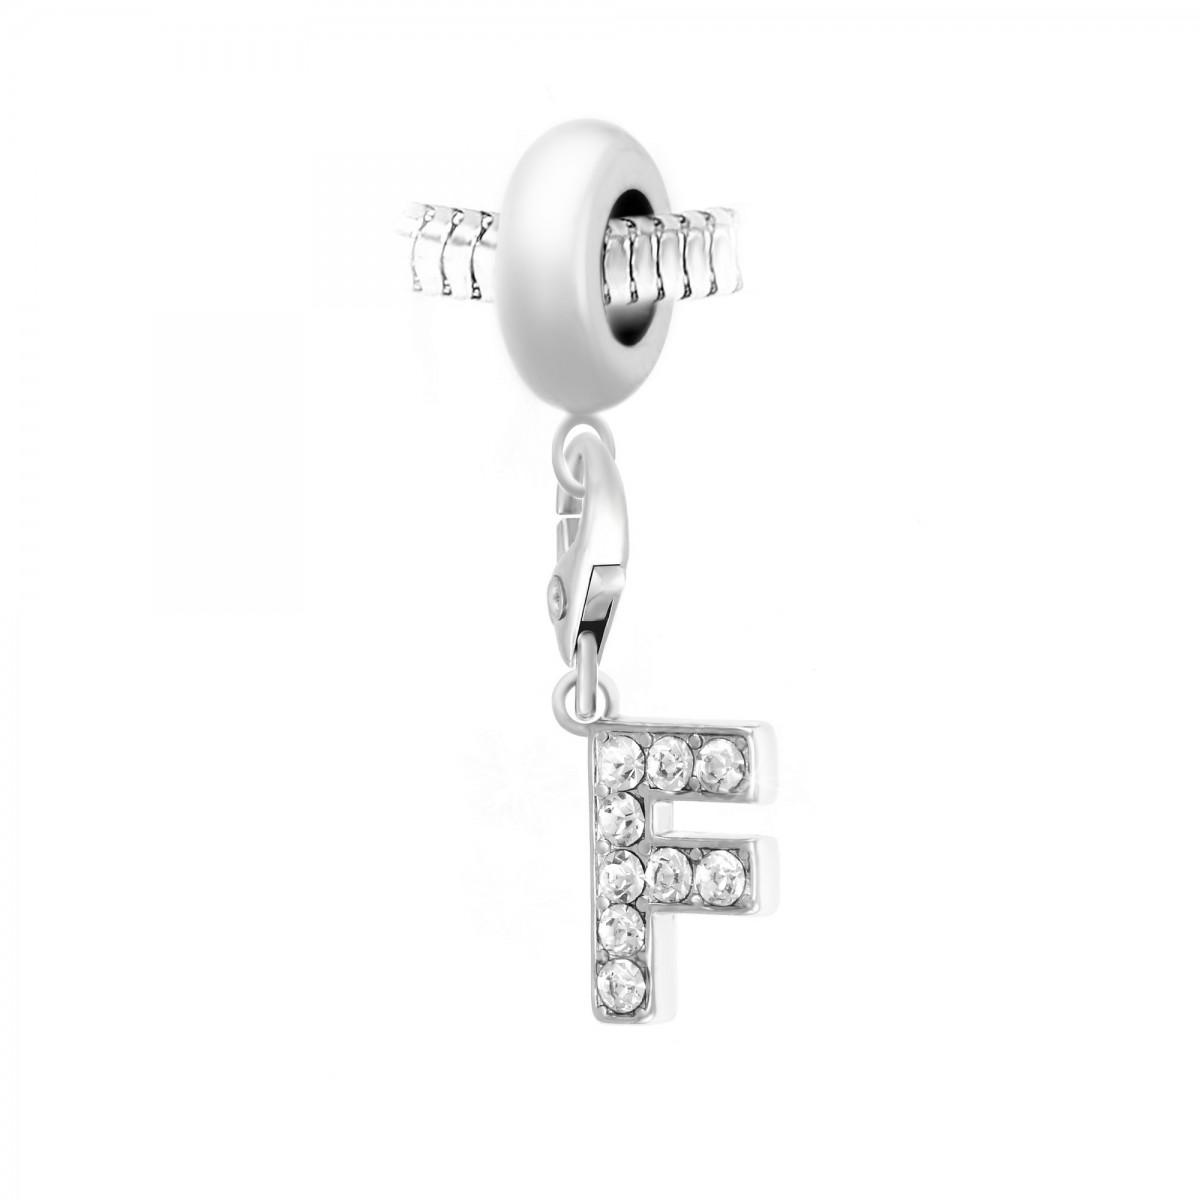 Charm perle So Charm en acier avec pendentif lettre F made with crystal from Swarovski